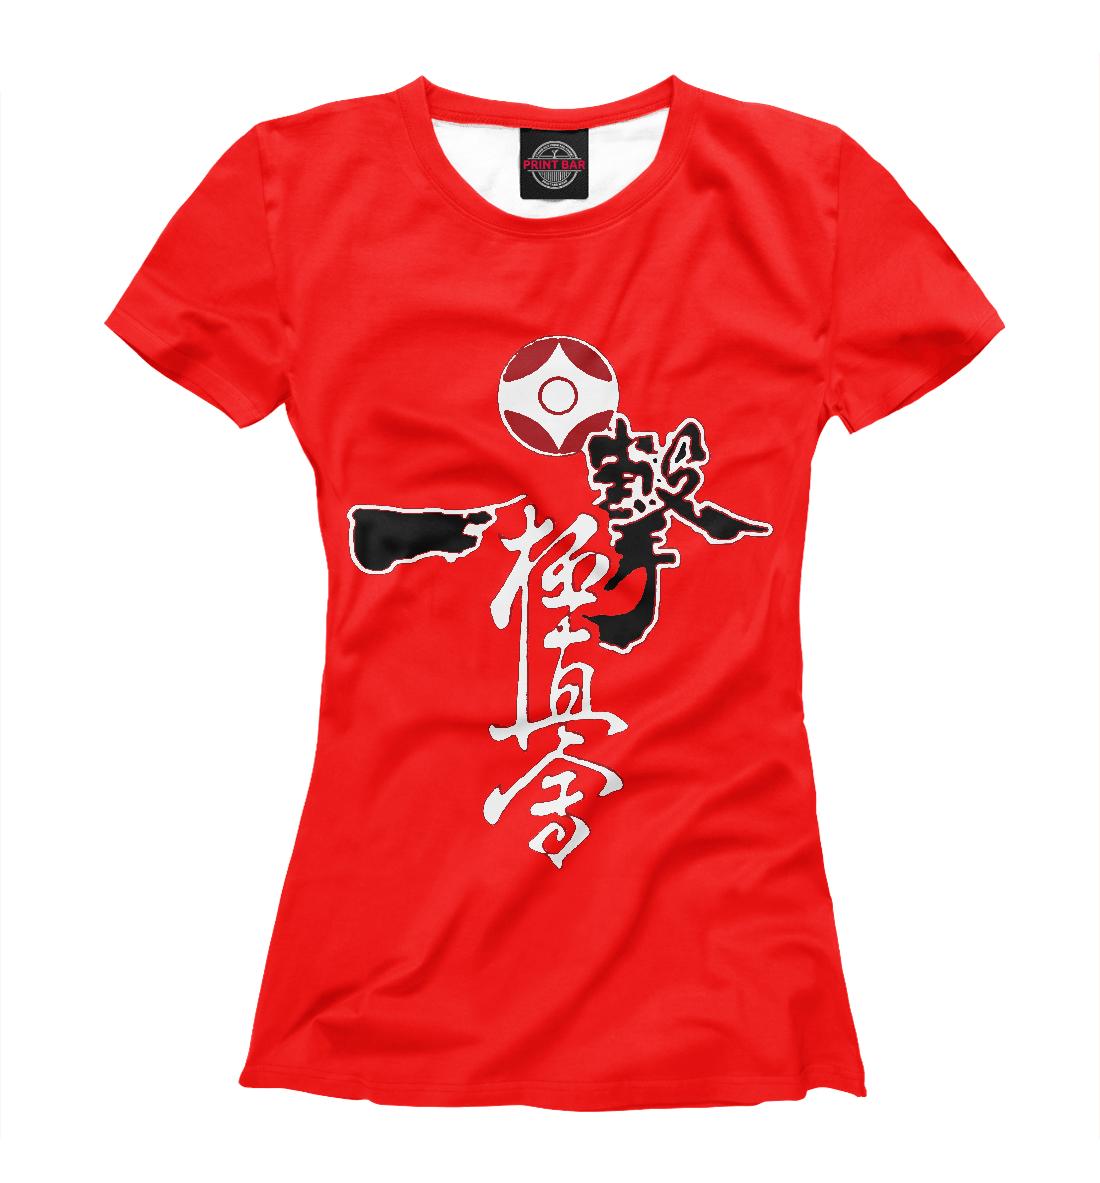 Купить Kyokushinkai Hieroglyph, Printbar, Футболки, EDI-951615-fut-1